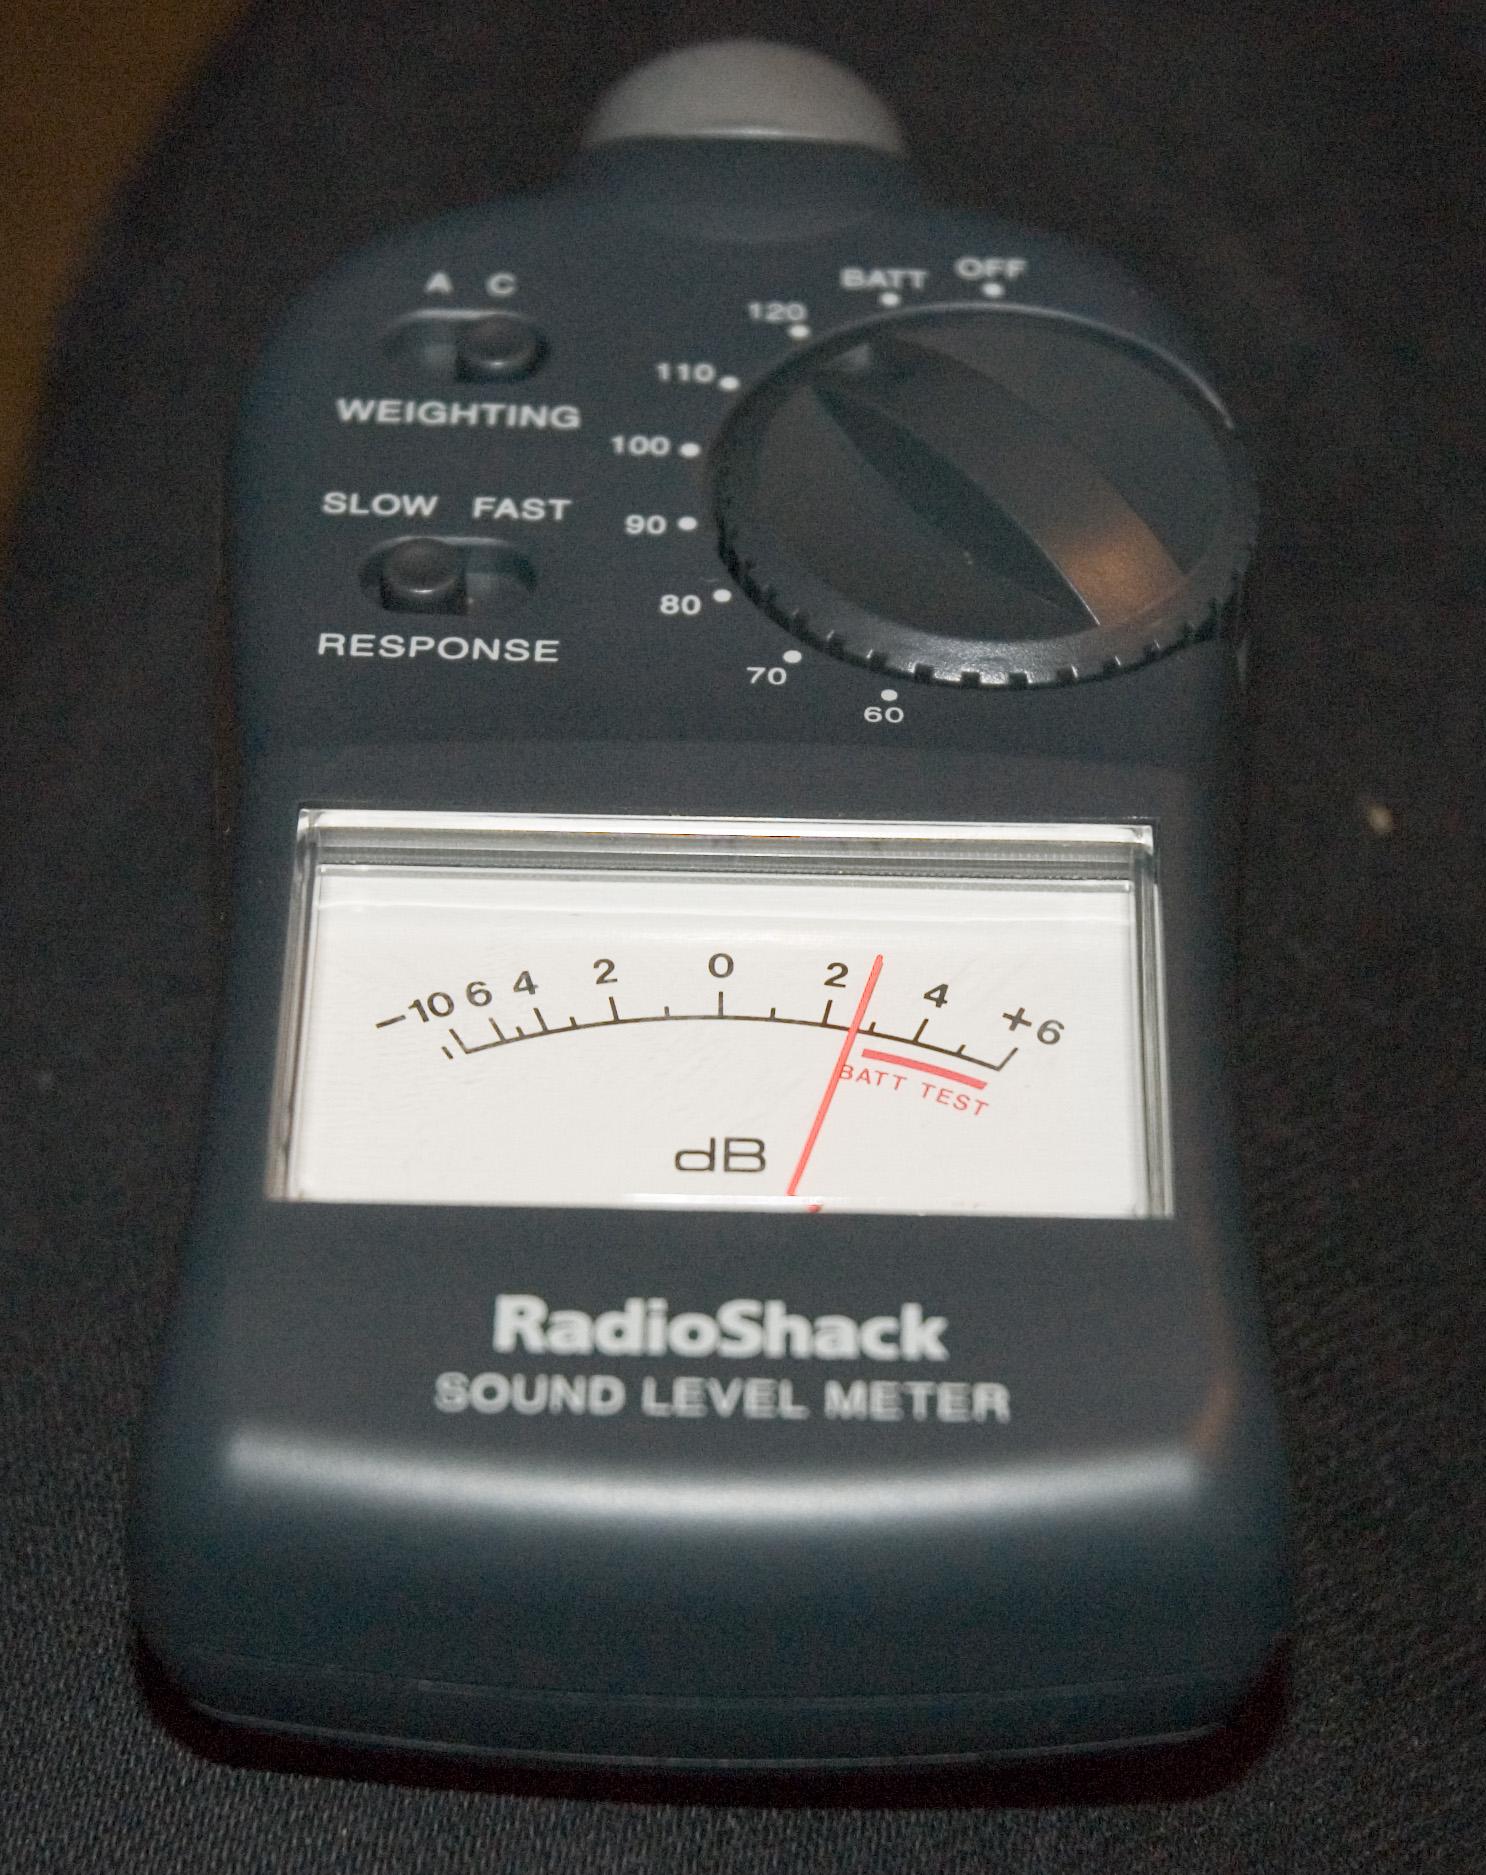 Radioshack analog meter @ 123dB C-weighted slow